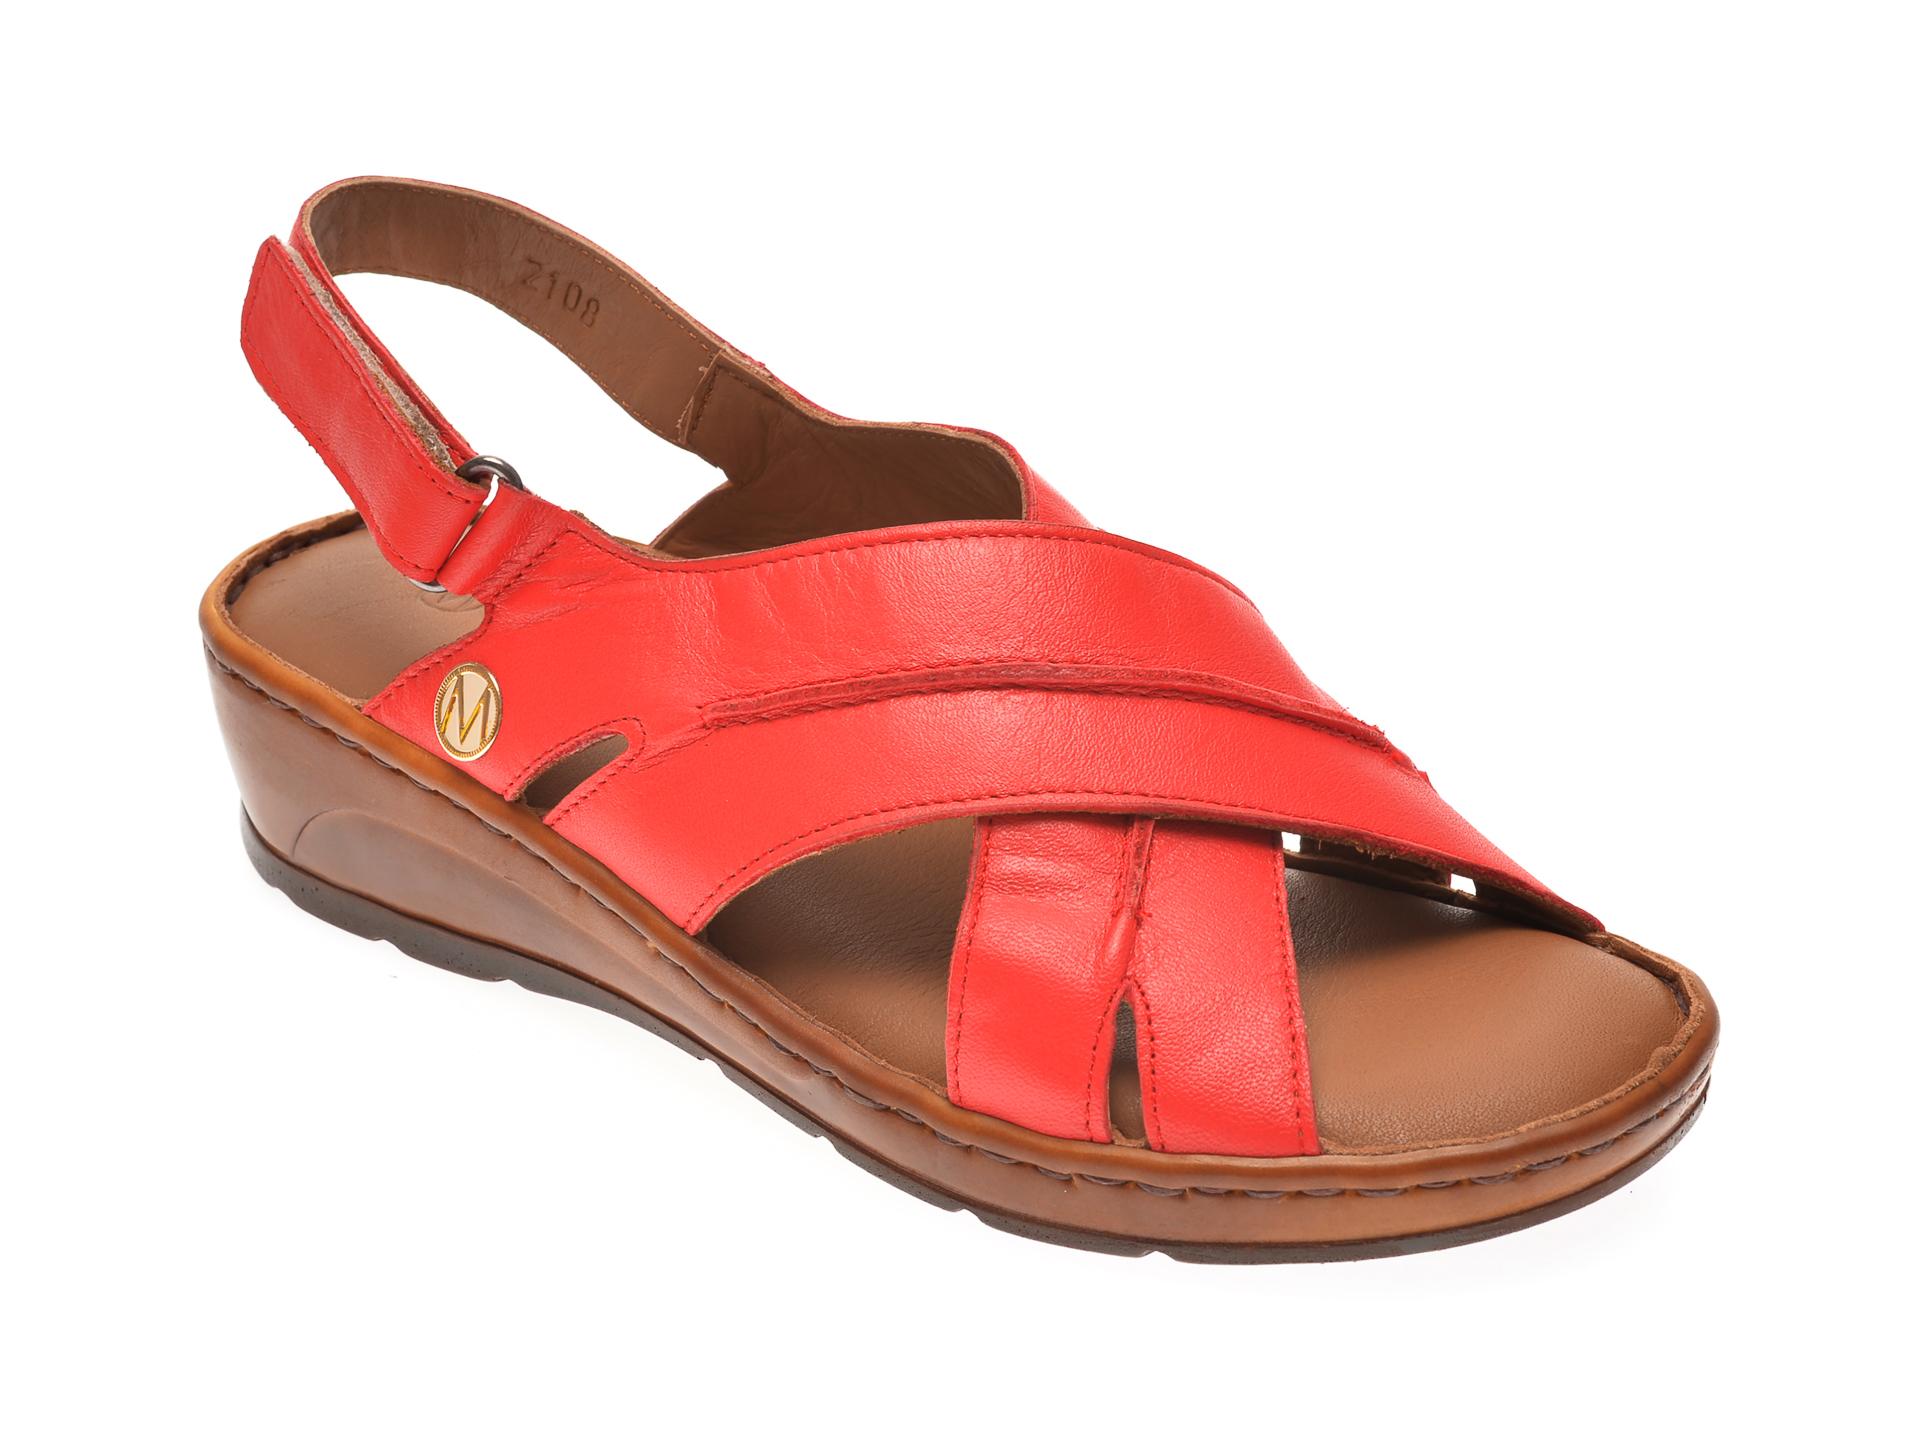 Sandale MESSIMODA rosii, 20Y2108, din piele naturala